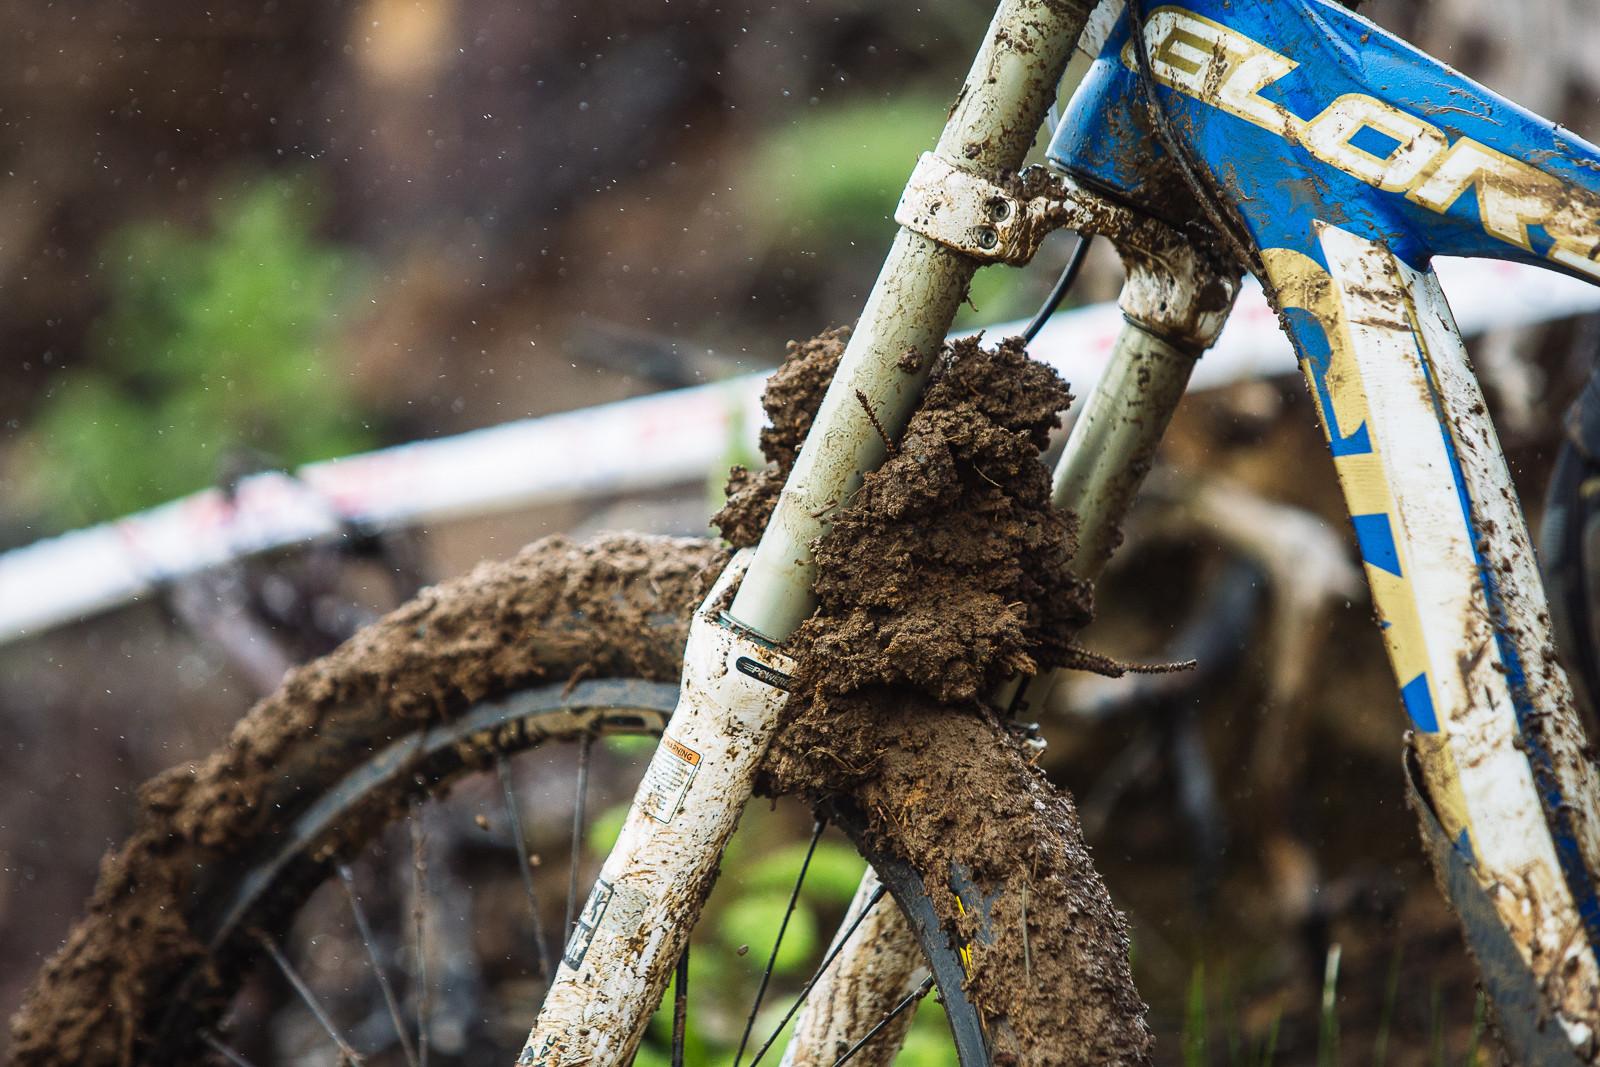 Thick Mud, British DH Series, Bala - RACE REPORT - 2015 British Downhill Series Bala - Mountain Biking Pictures - Vital MTB